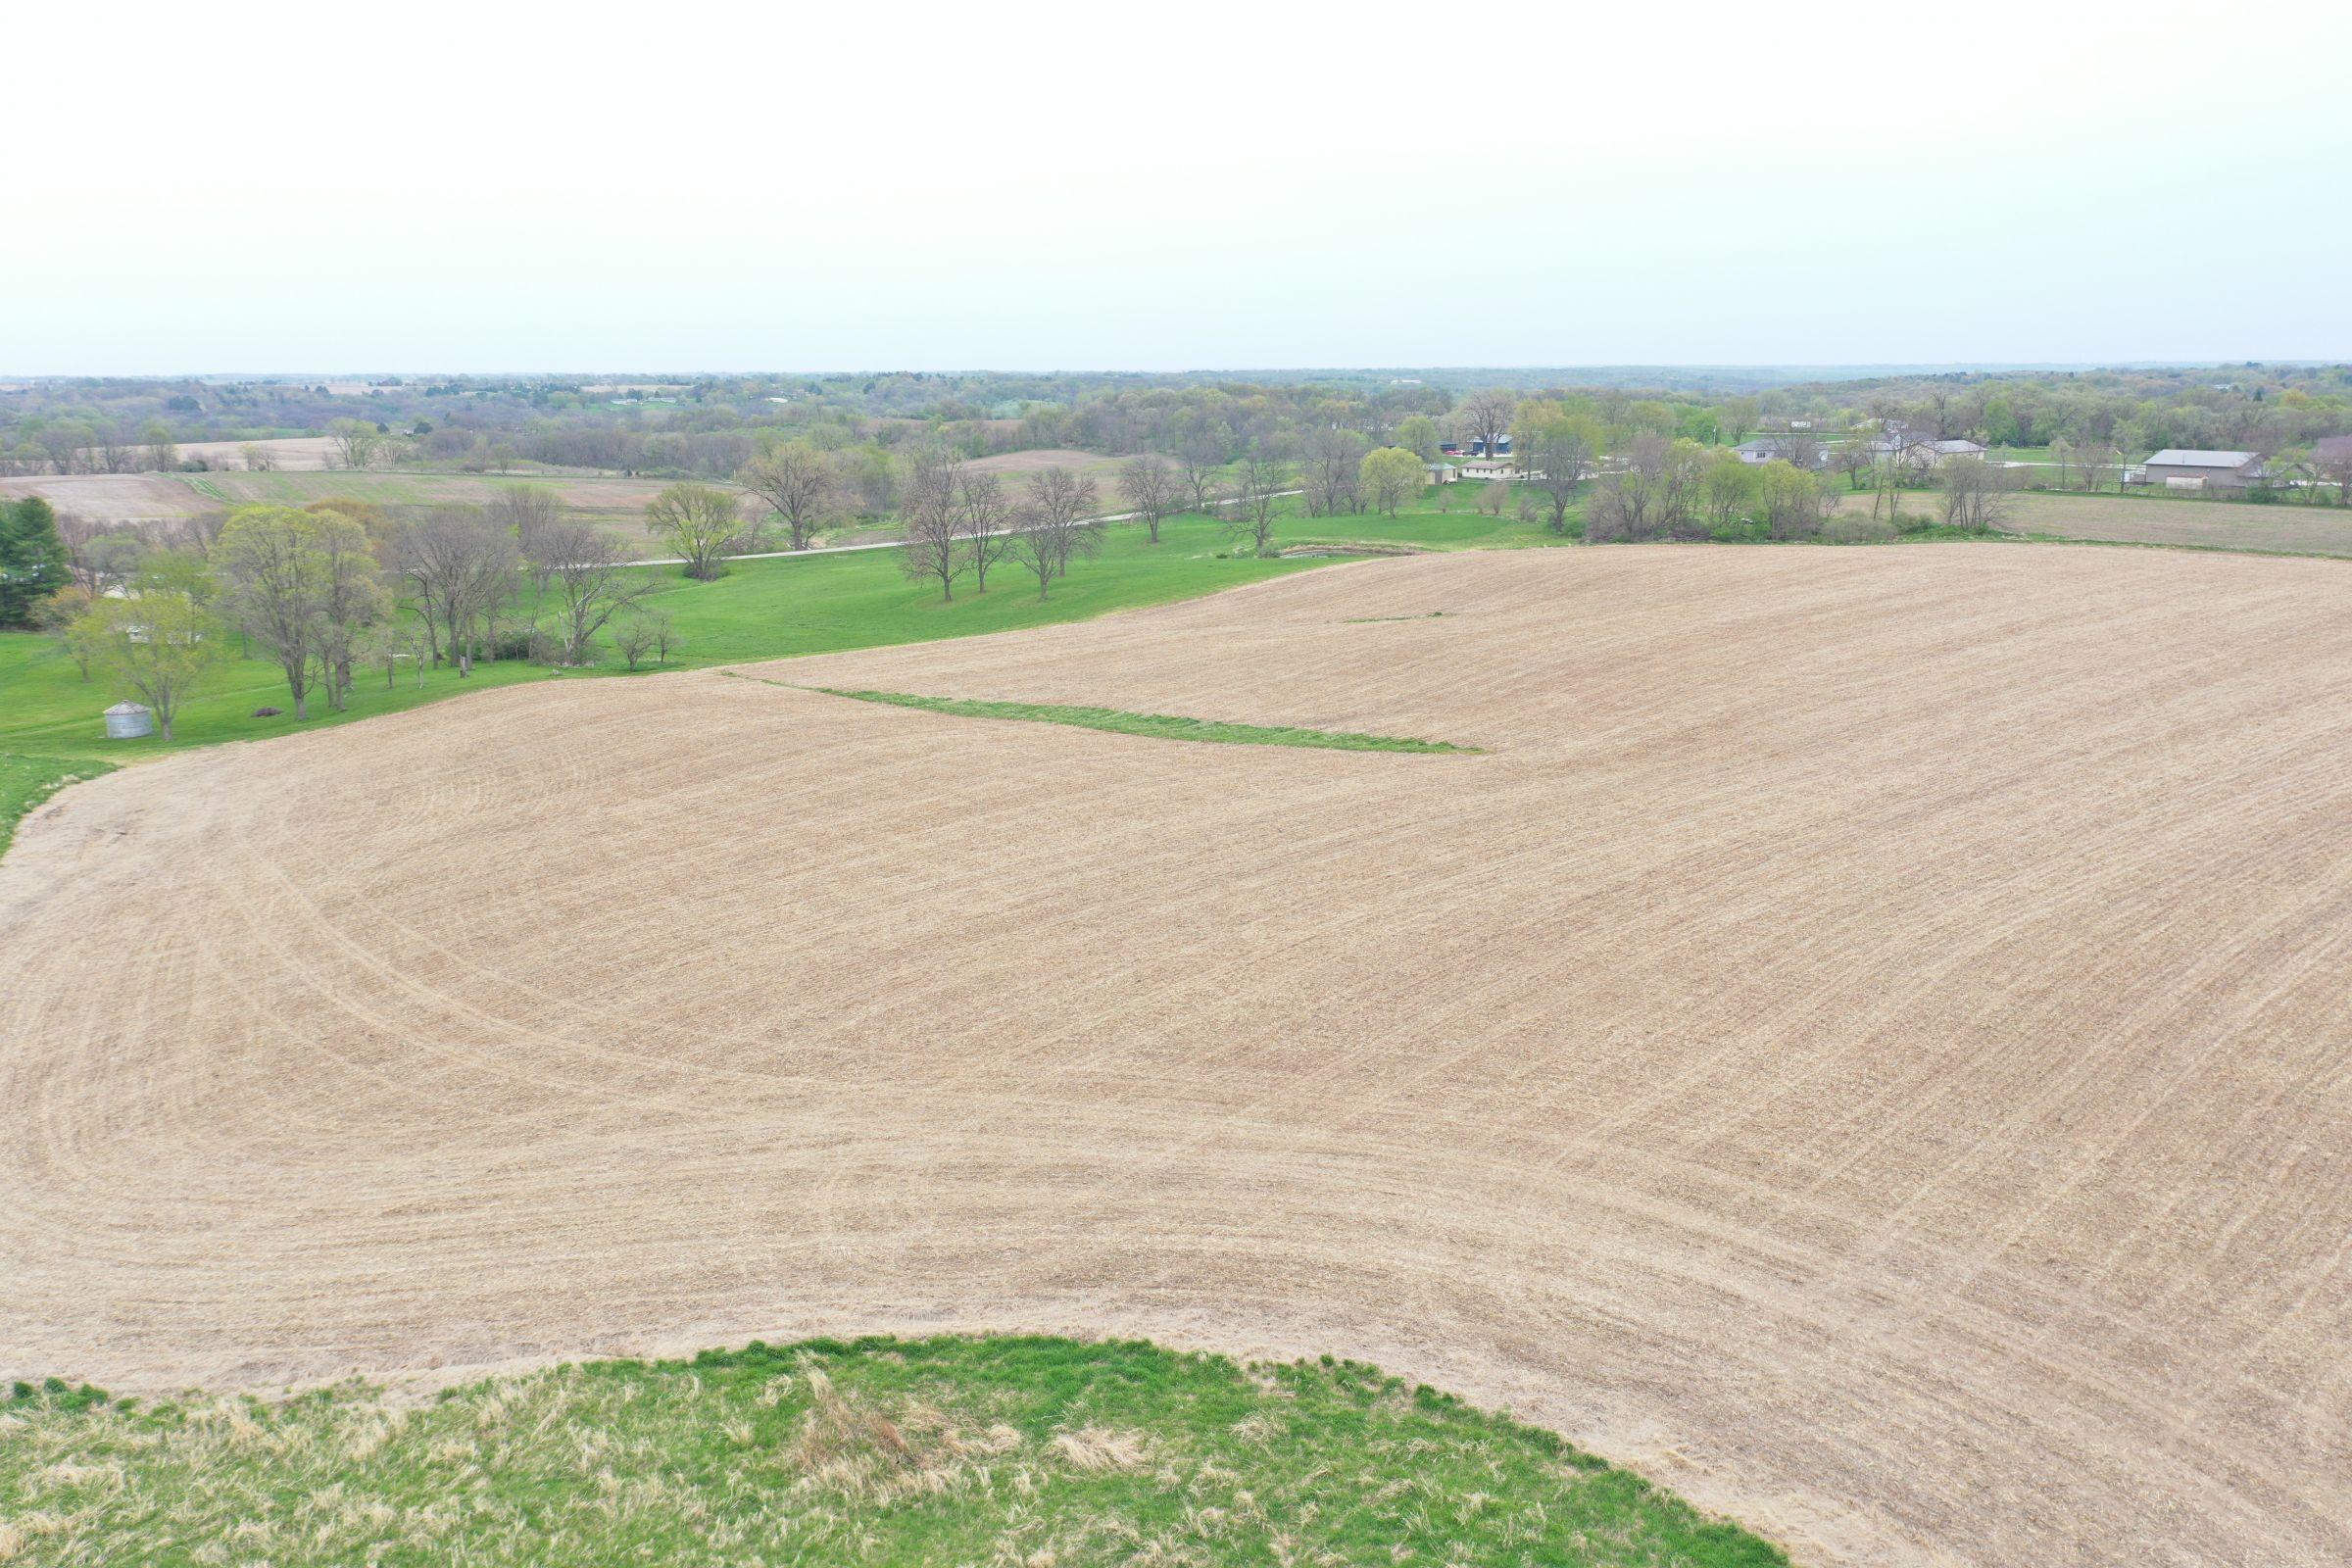 residential-polk-county-iowa-34-acres-listing-number-15502-2-2021-04-29-143443.JPG